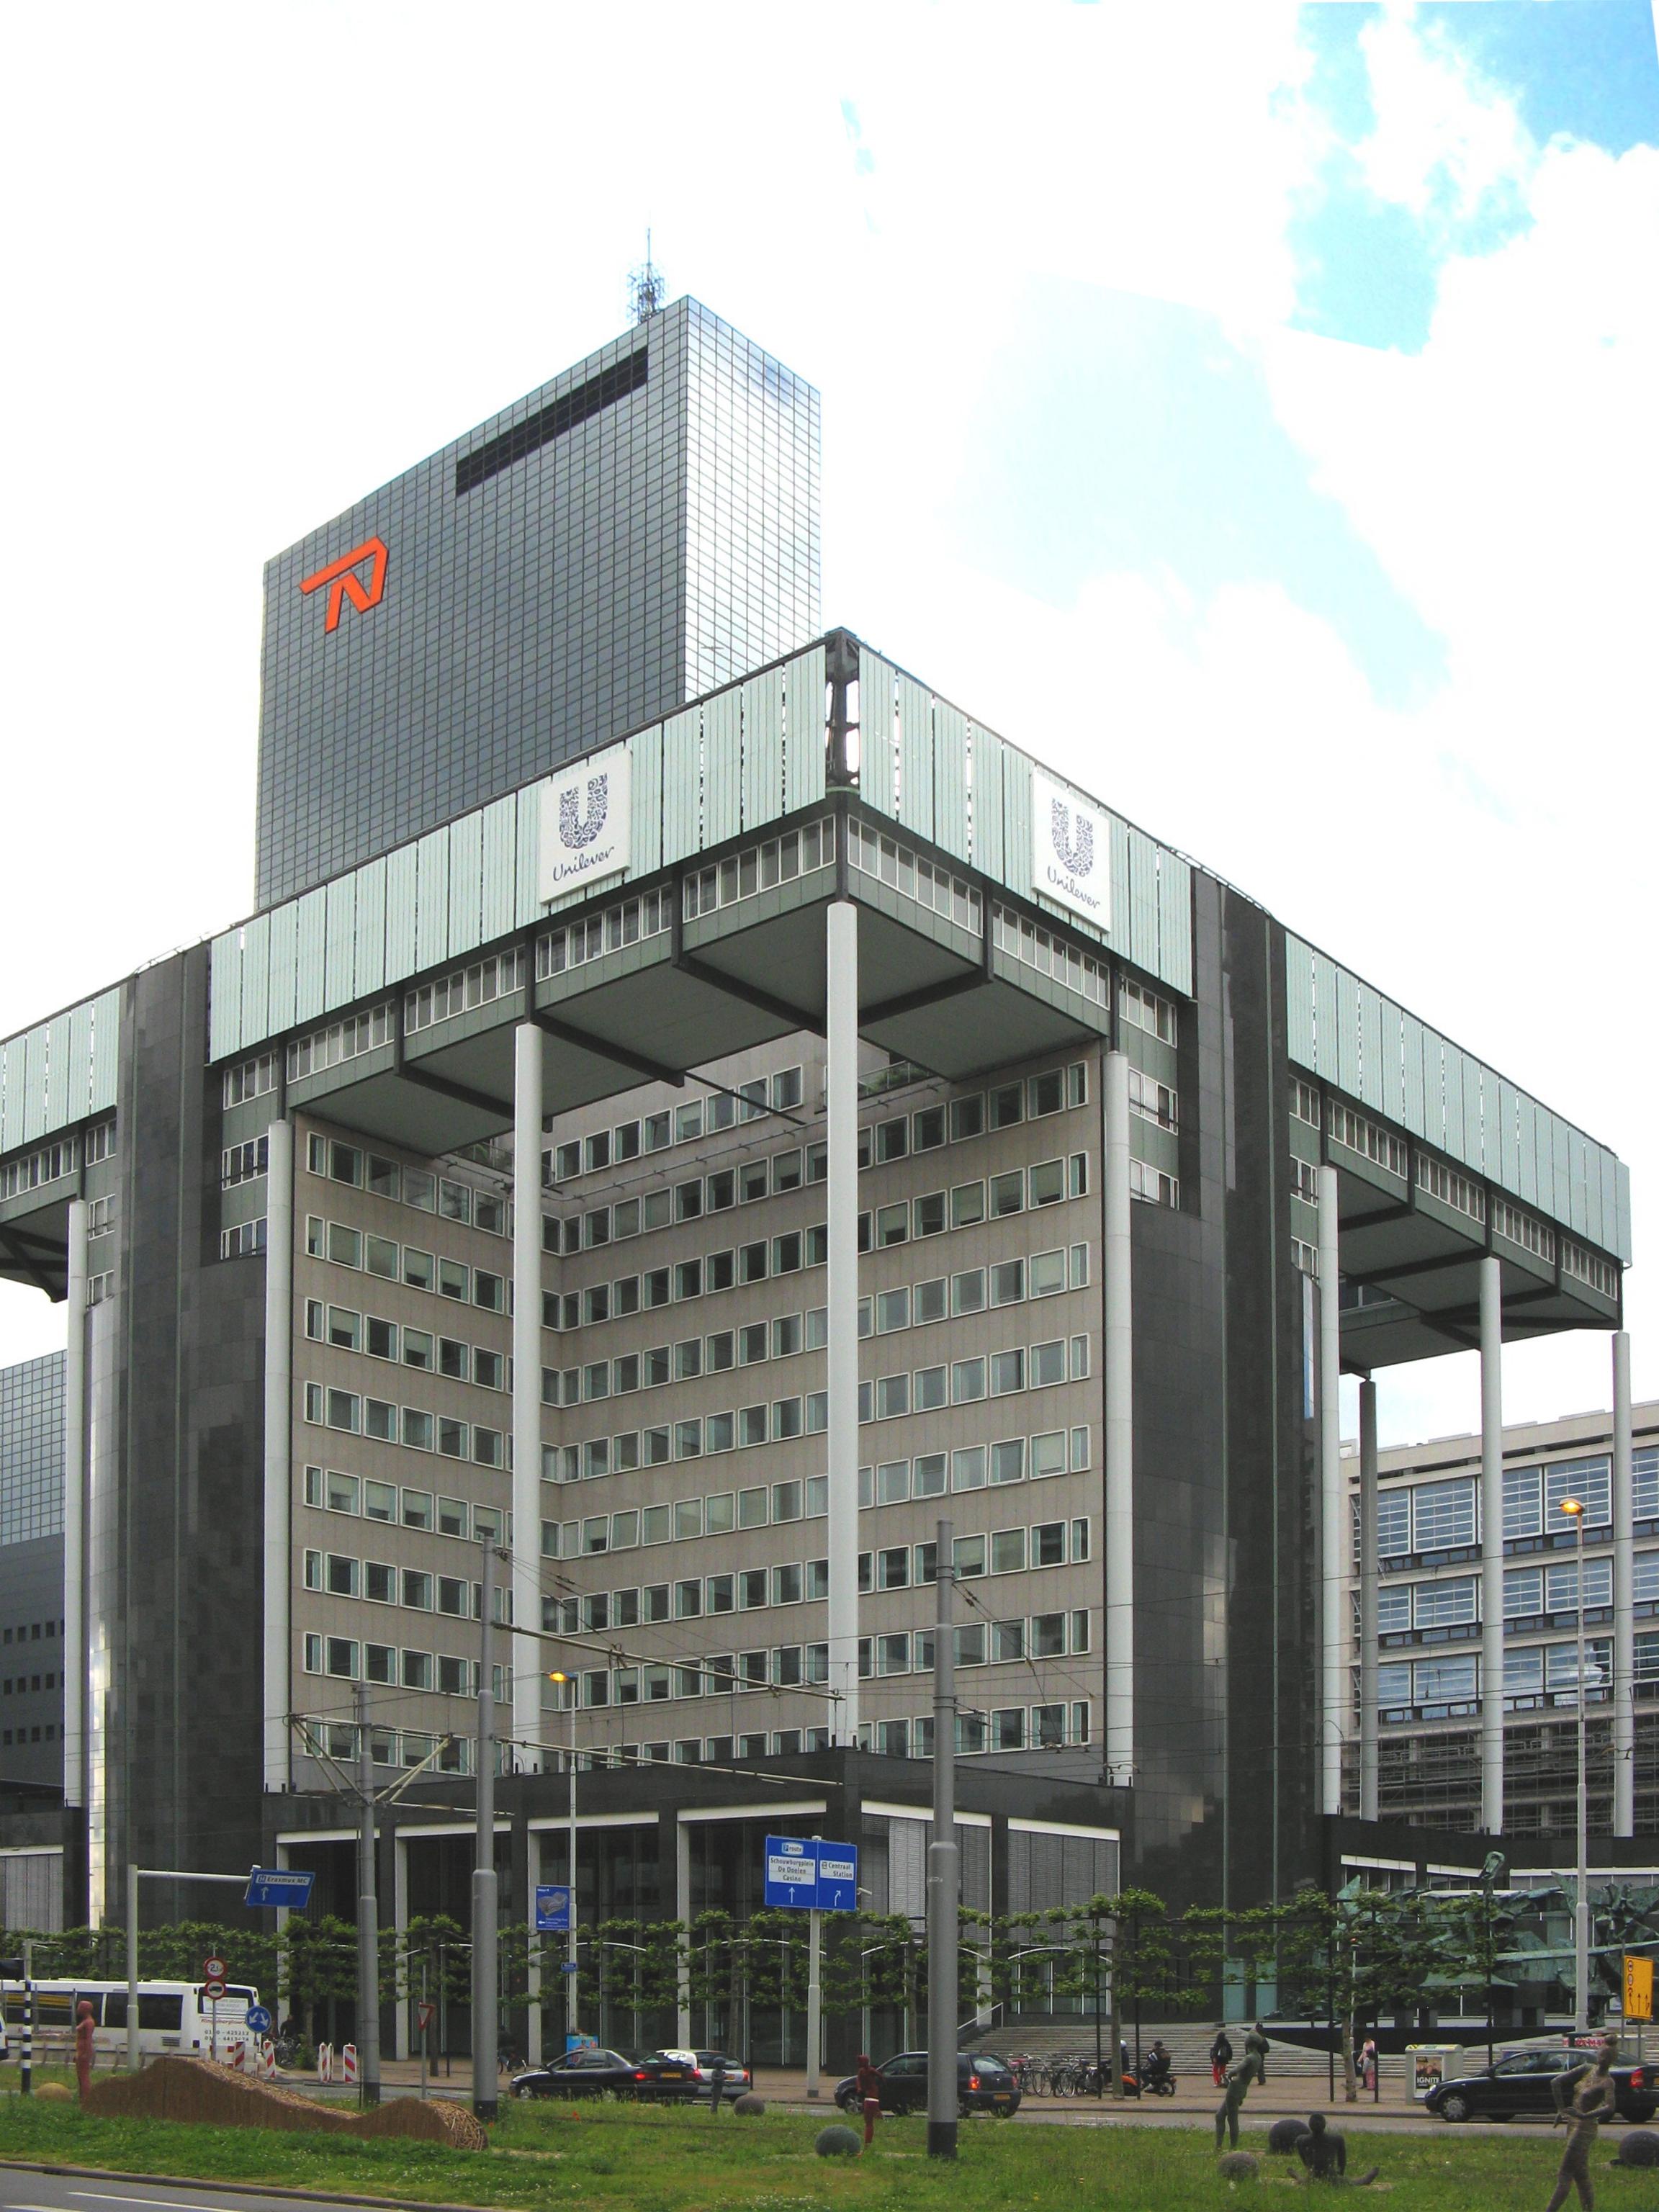 unilever main office. File:Unilever Head Office Building Rotterdam.jpg Unilever Main N